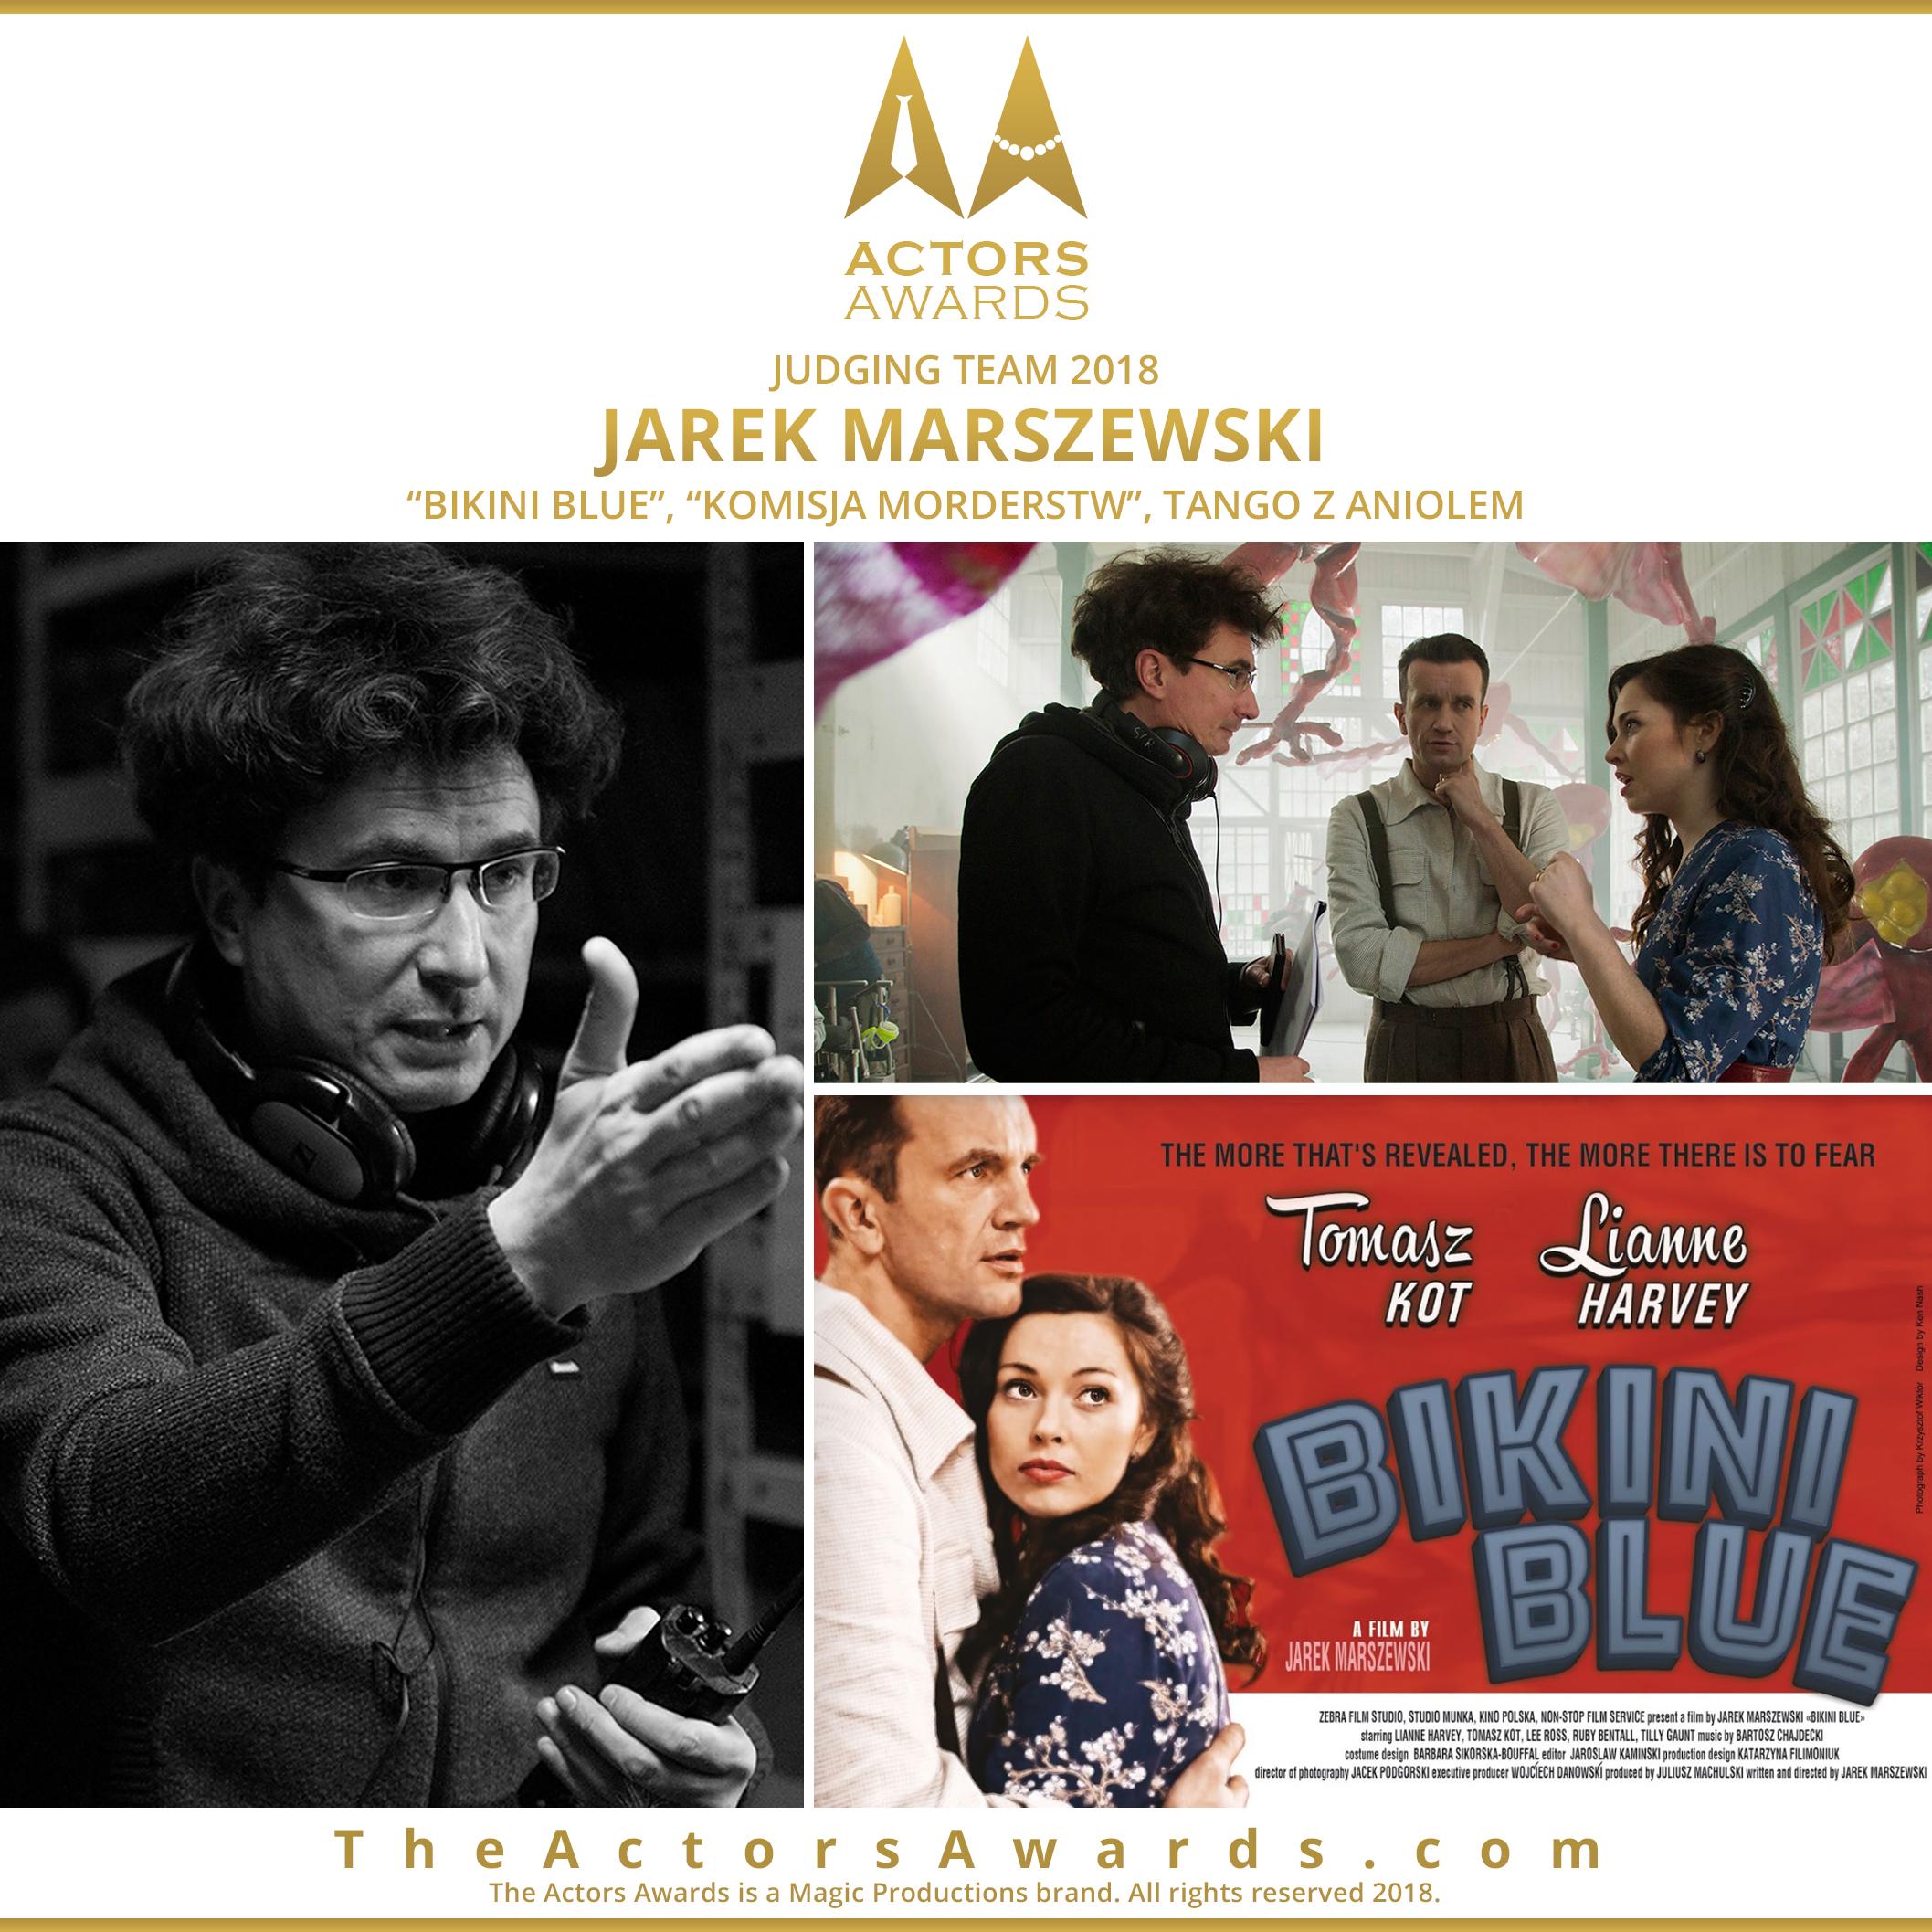 Actors Awards 2018 - Jarek Marszewski